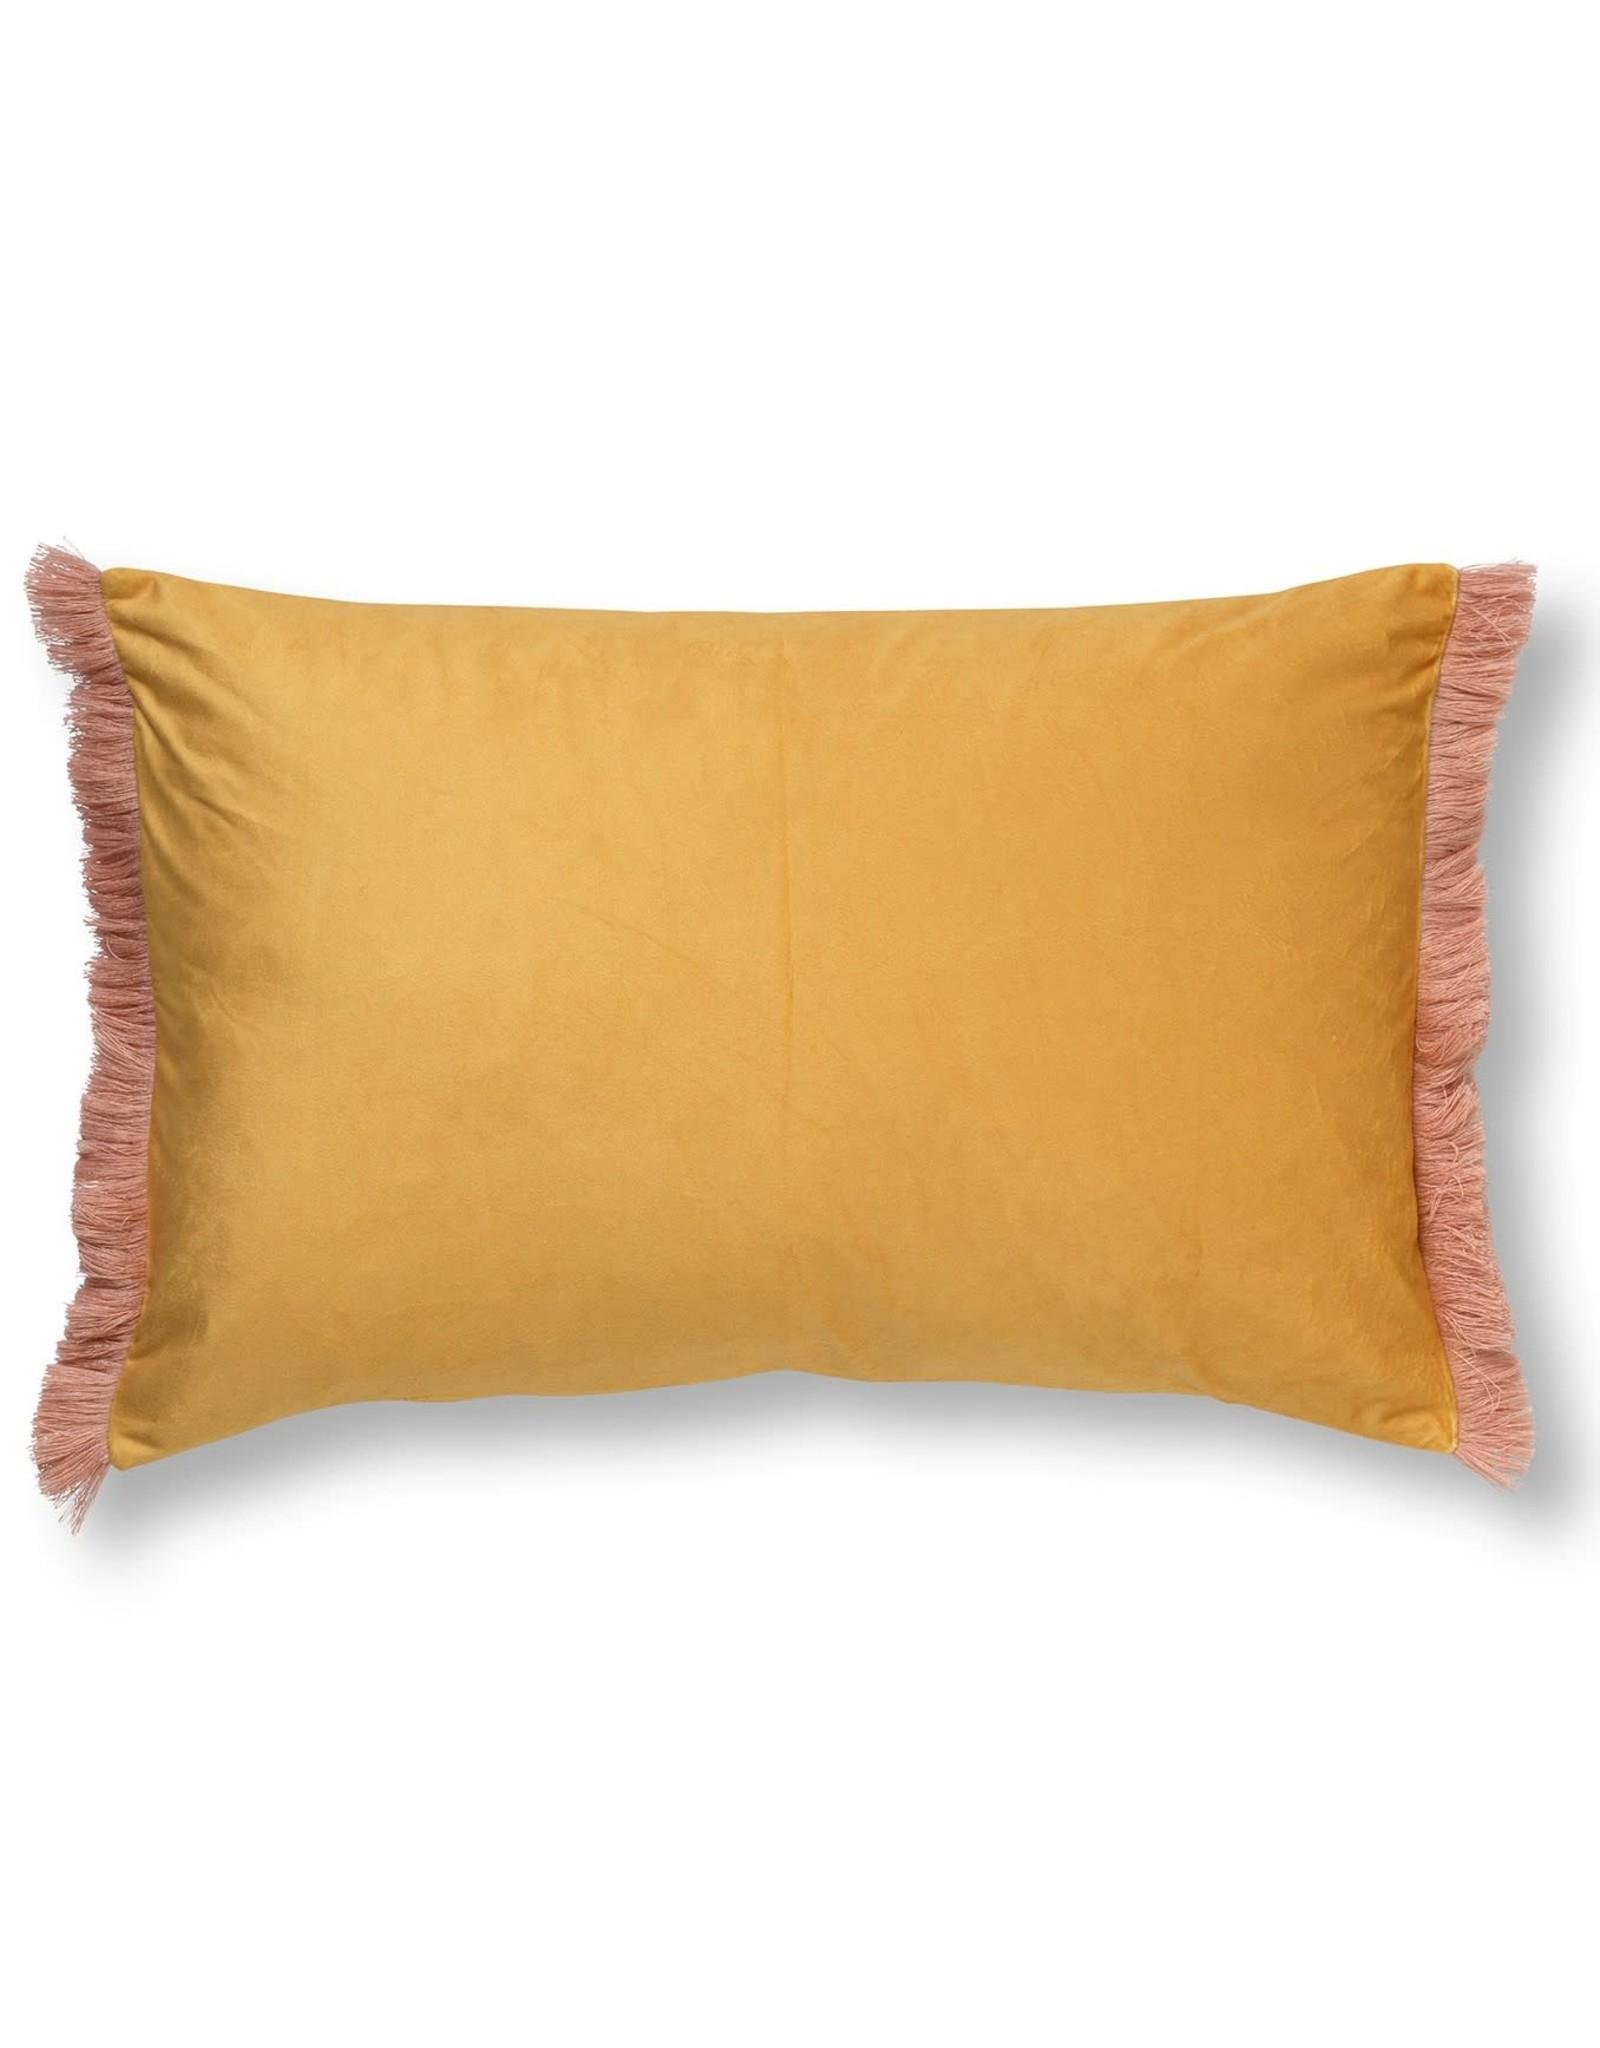 Dutch Decor Kussen - Bloom Golden Glow